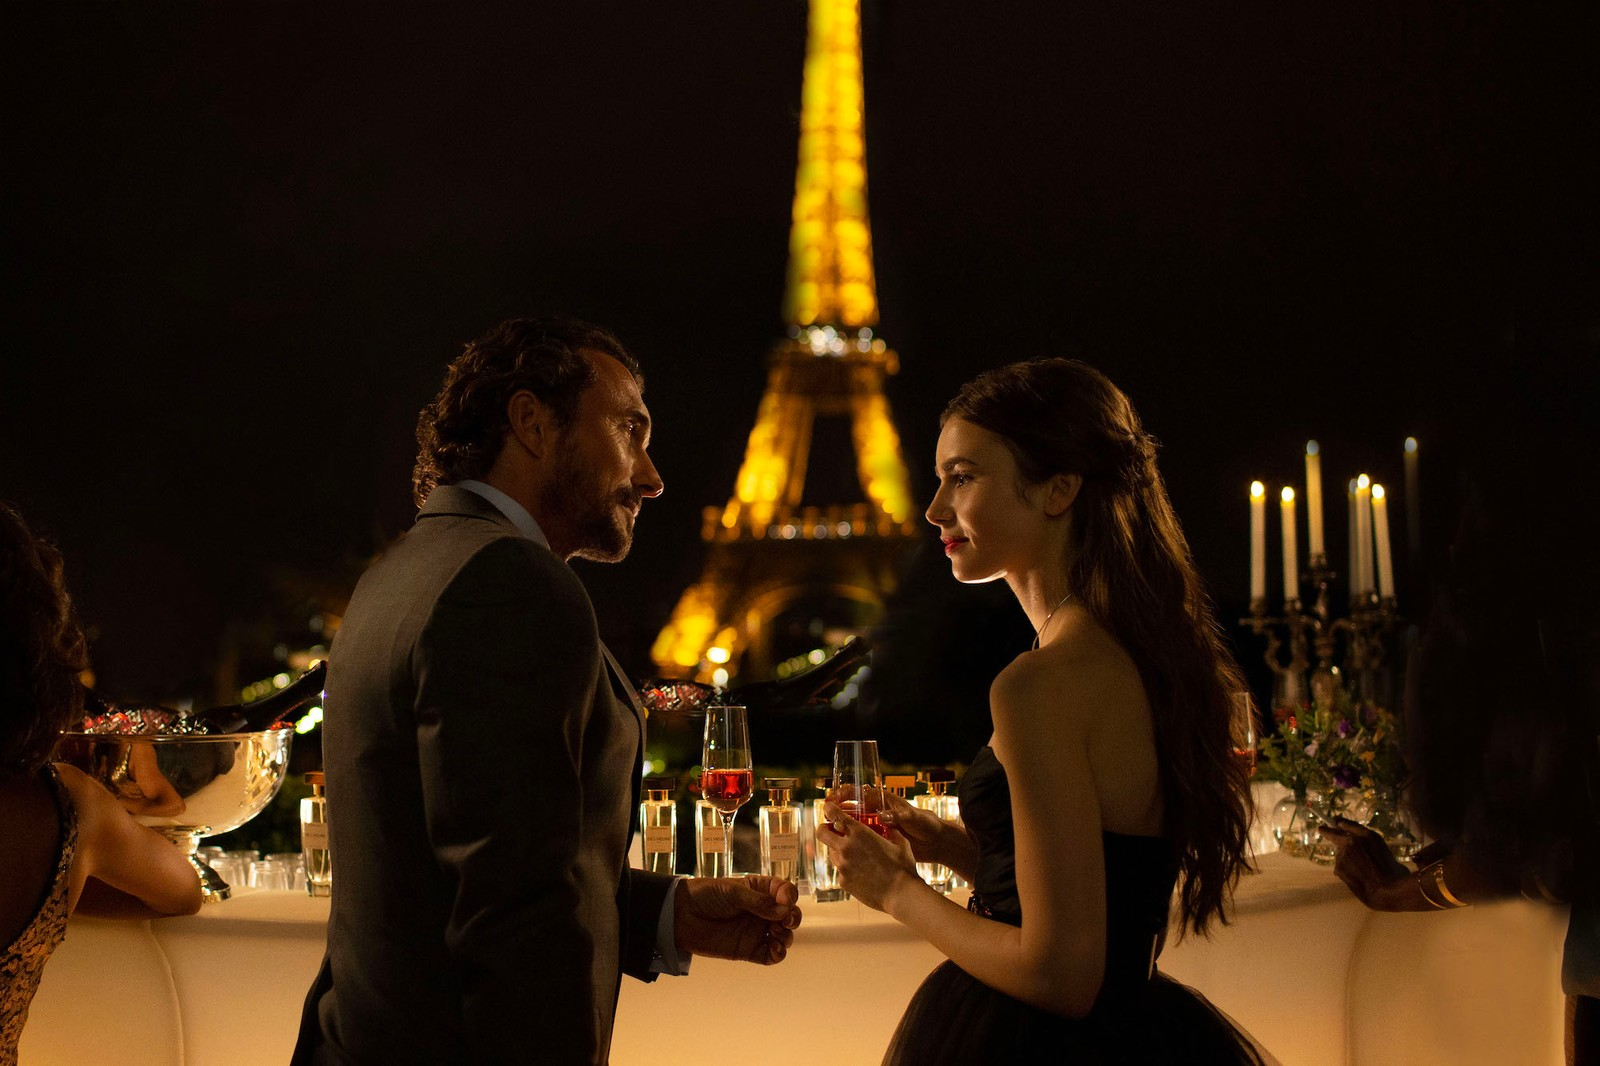 Emily in Paris Netflix Series Lily Collins Fashion Creative Media Business Social Media Unrealistic Op-Ed